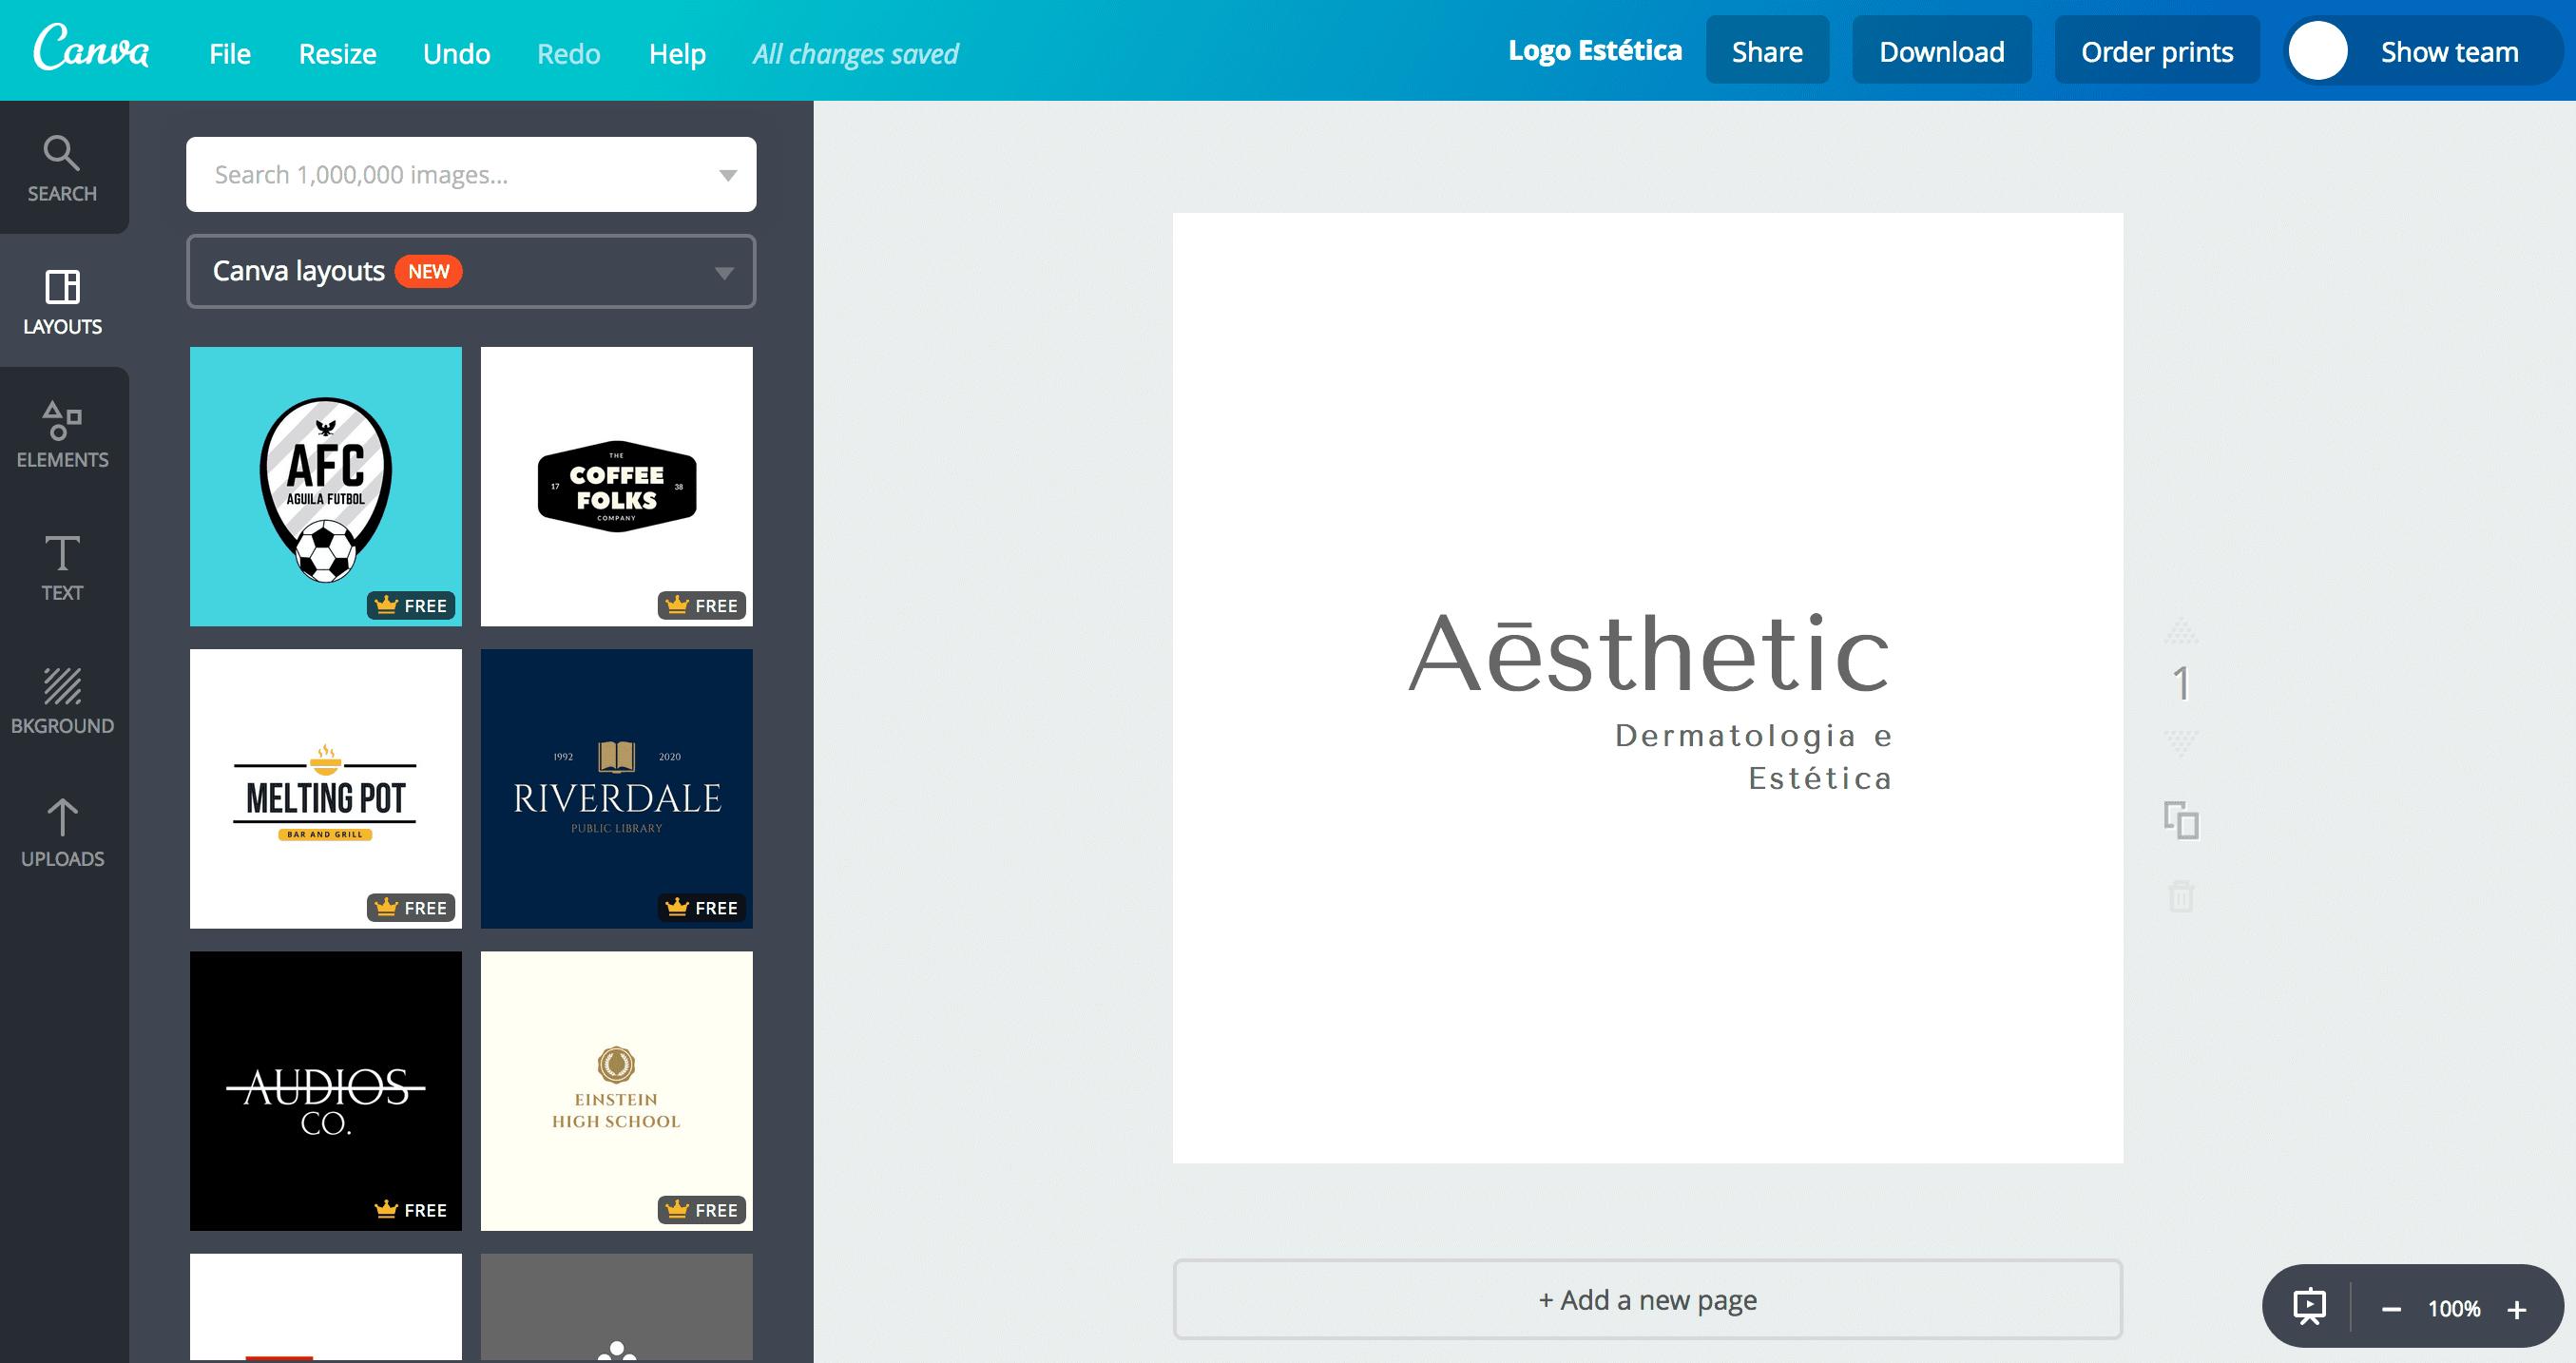 Logo de estética